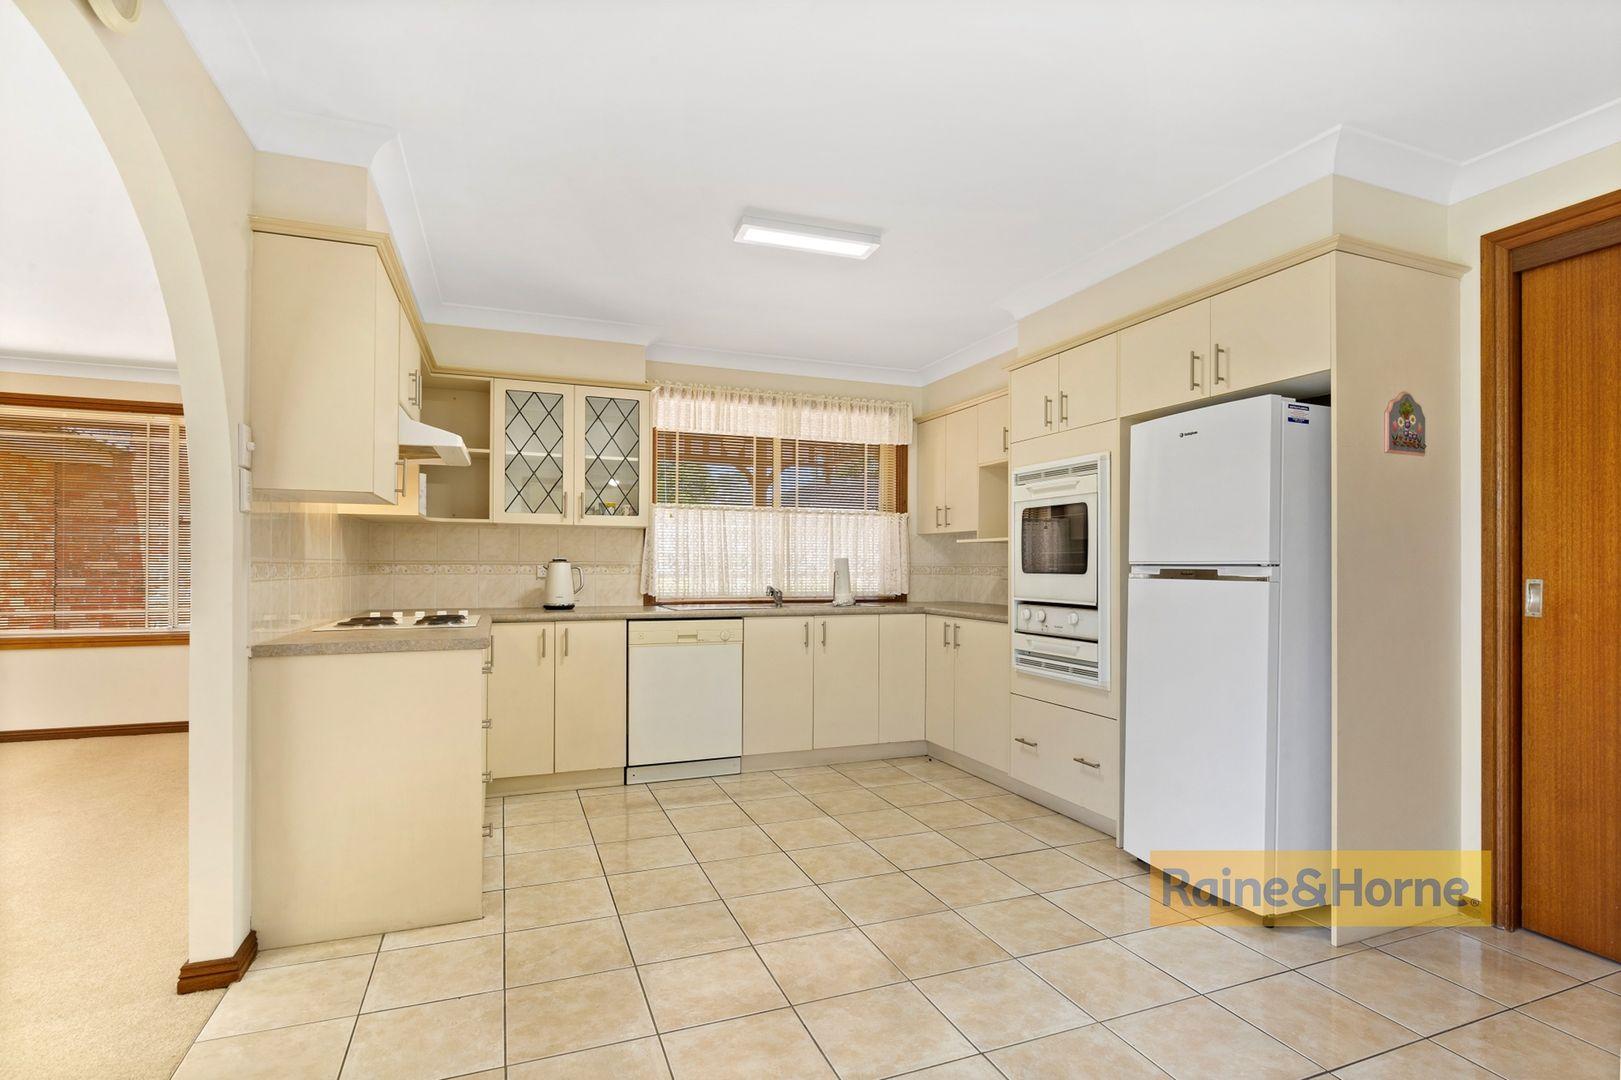 3/11 Farnell Road, Woy Woy NSW 2256, Image 1